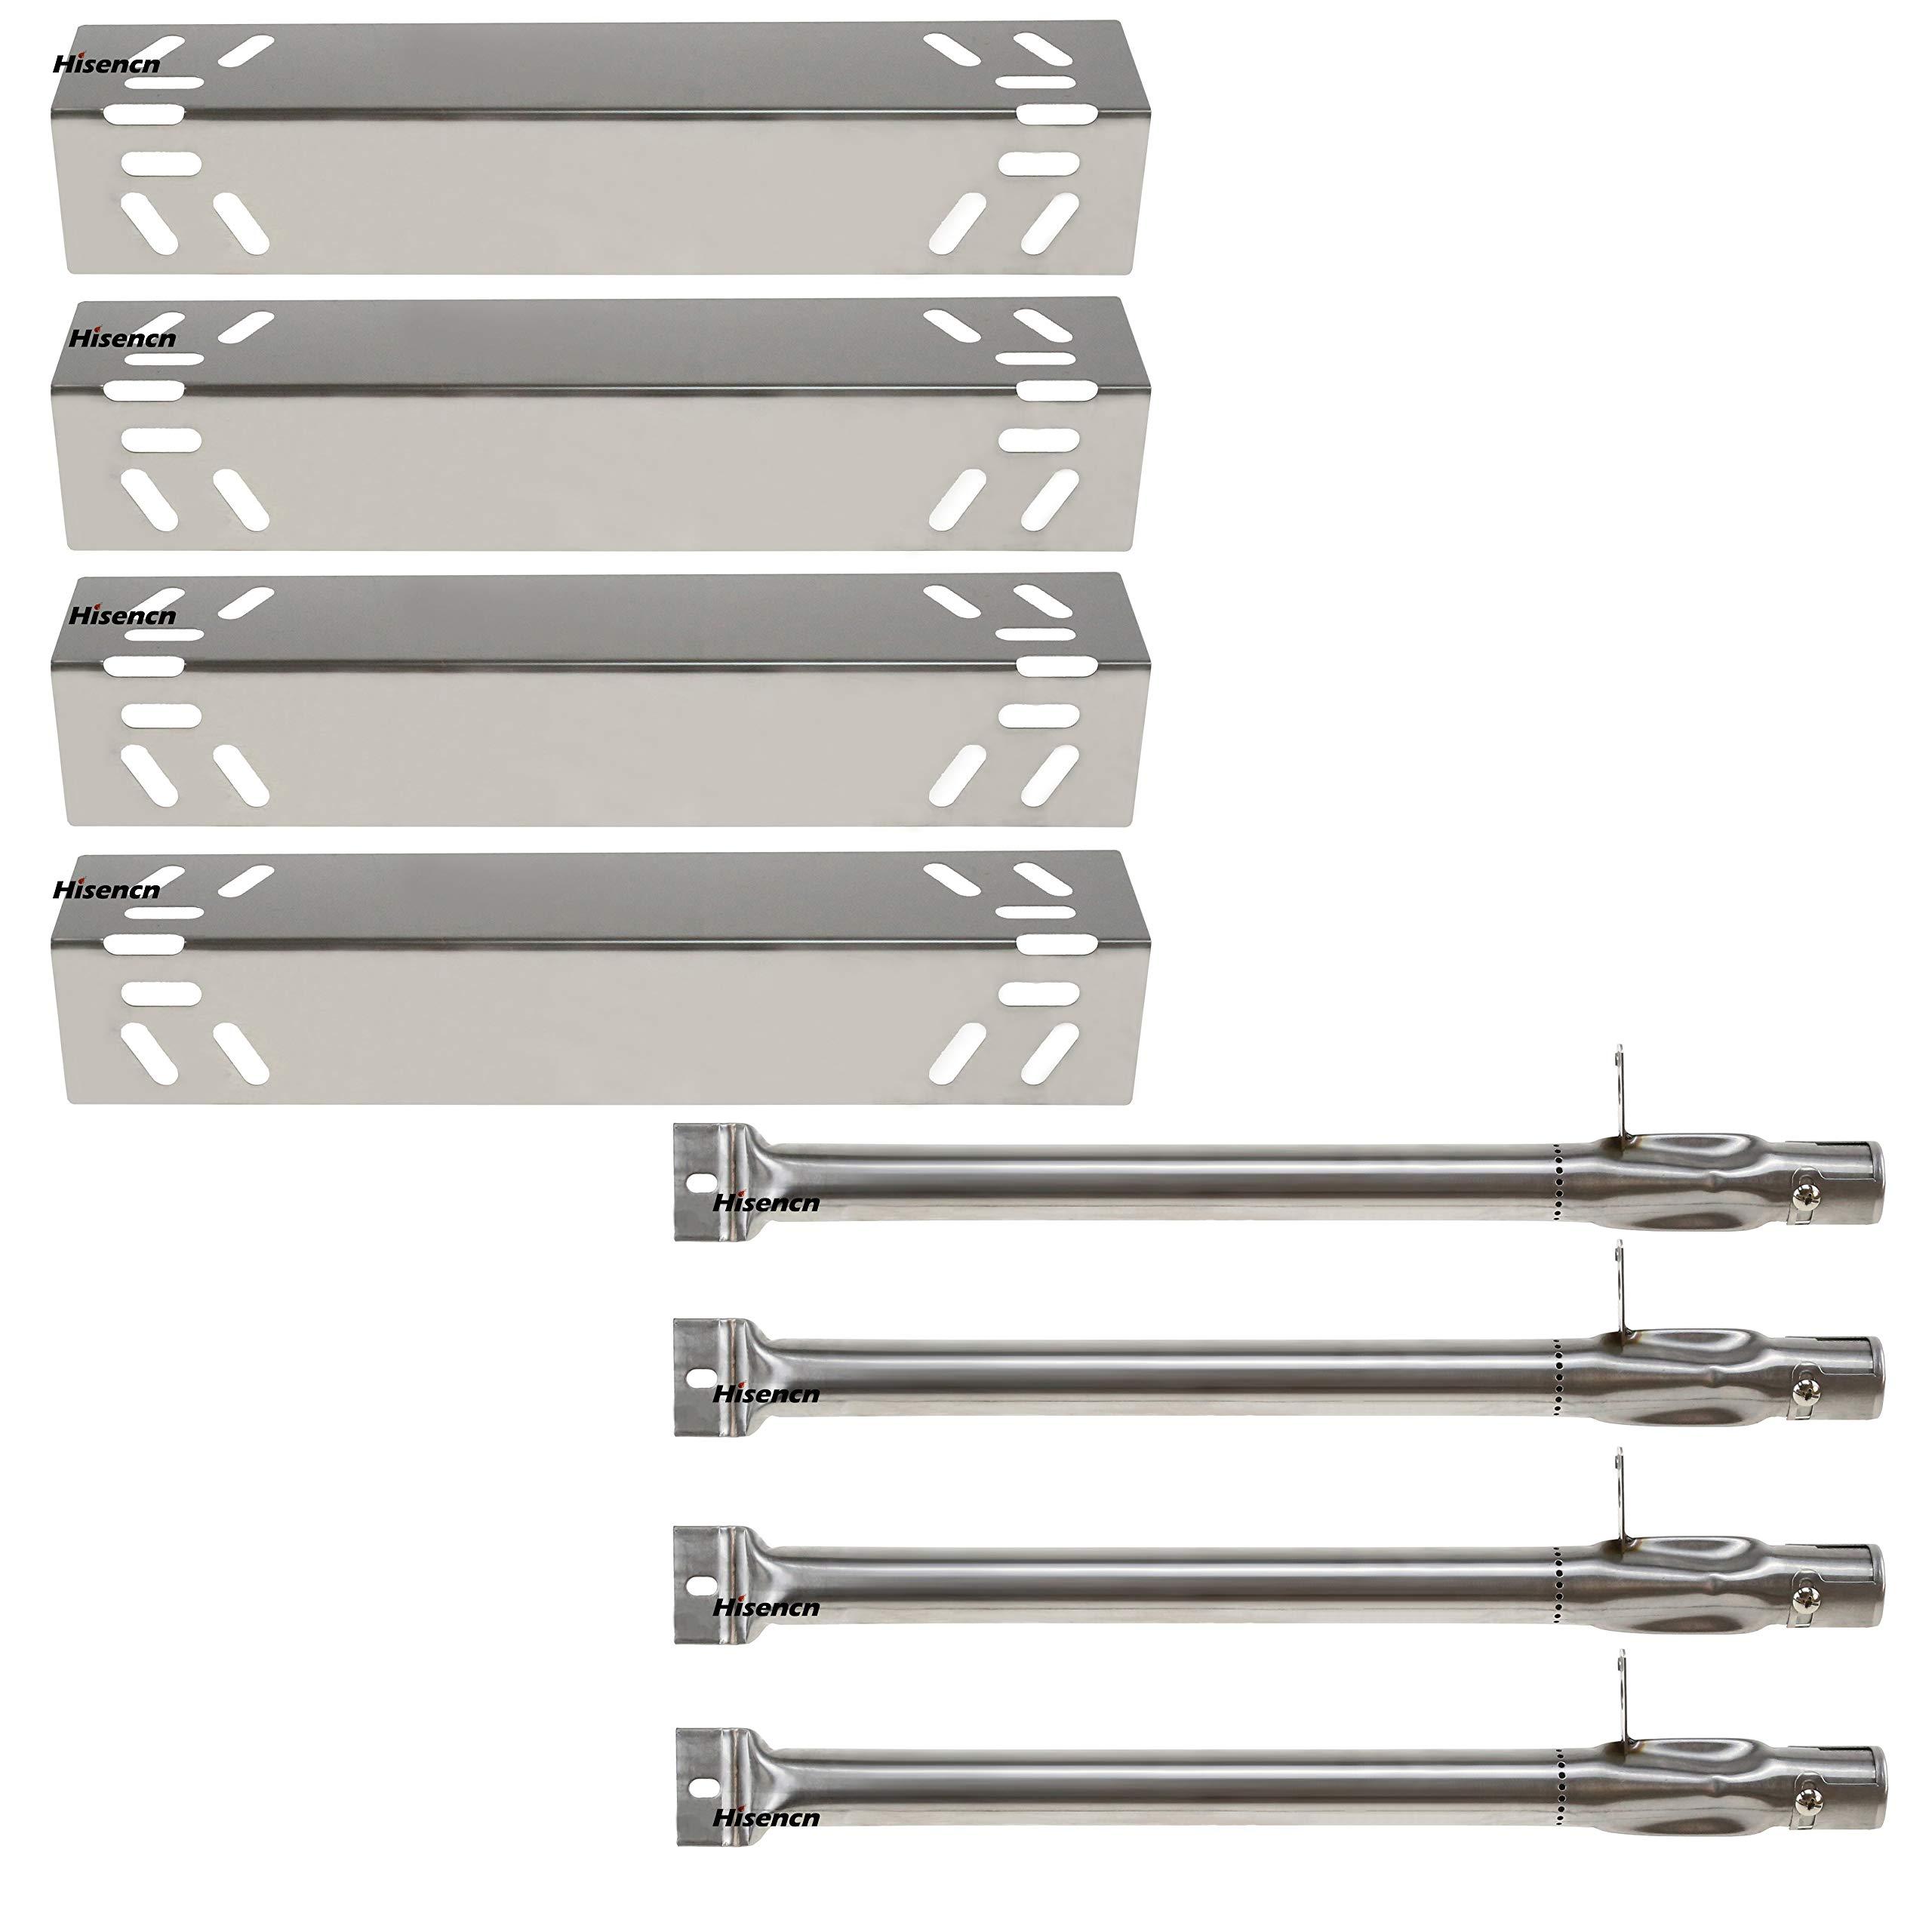 Hisencn Replacement Stainless Steel Burners & Heat Plate Flame Tamer Burner Cover Repair Kit for Kenmore 119.16240, 119.16433010, 119.16434010, 119.16658010 Gas Grill Models by Hisencn